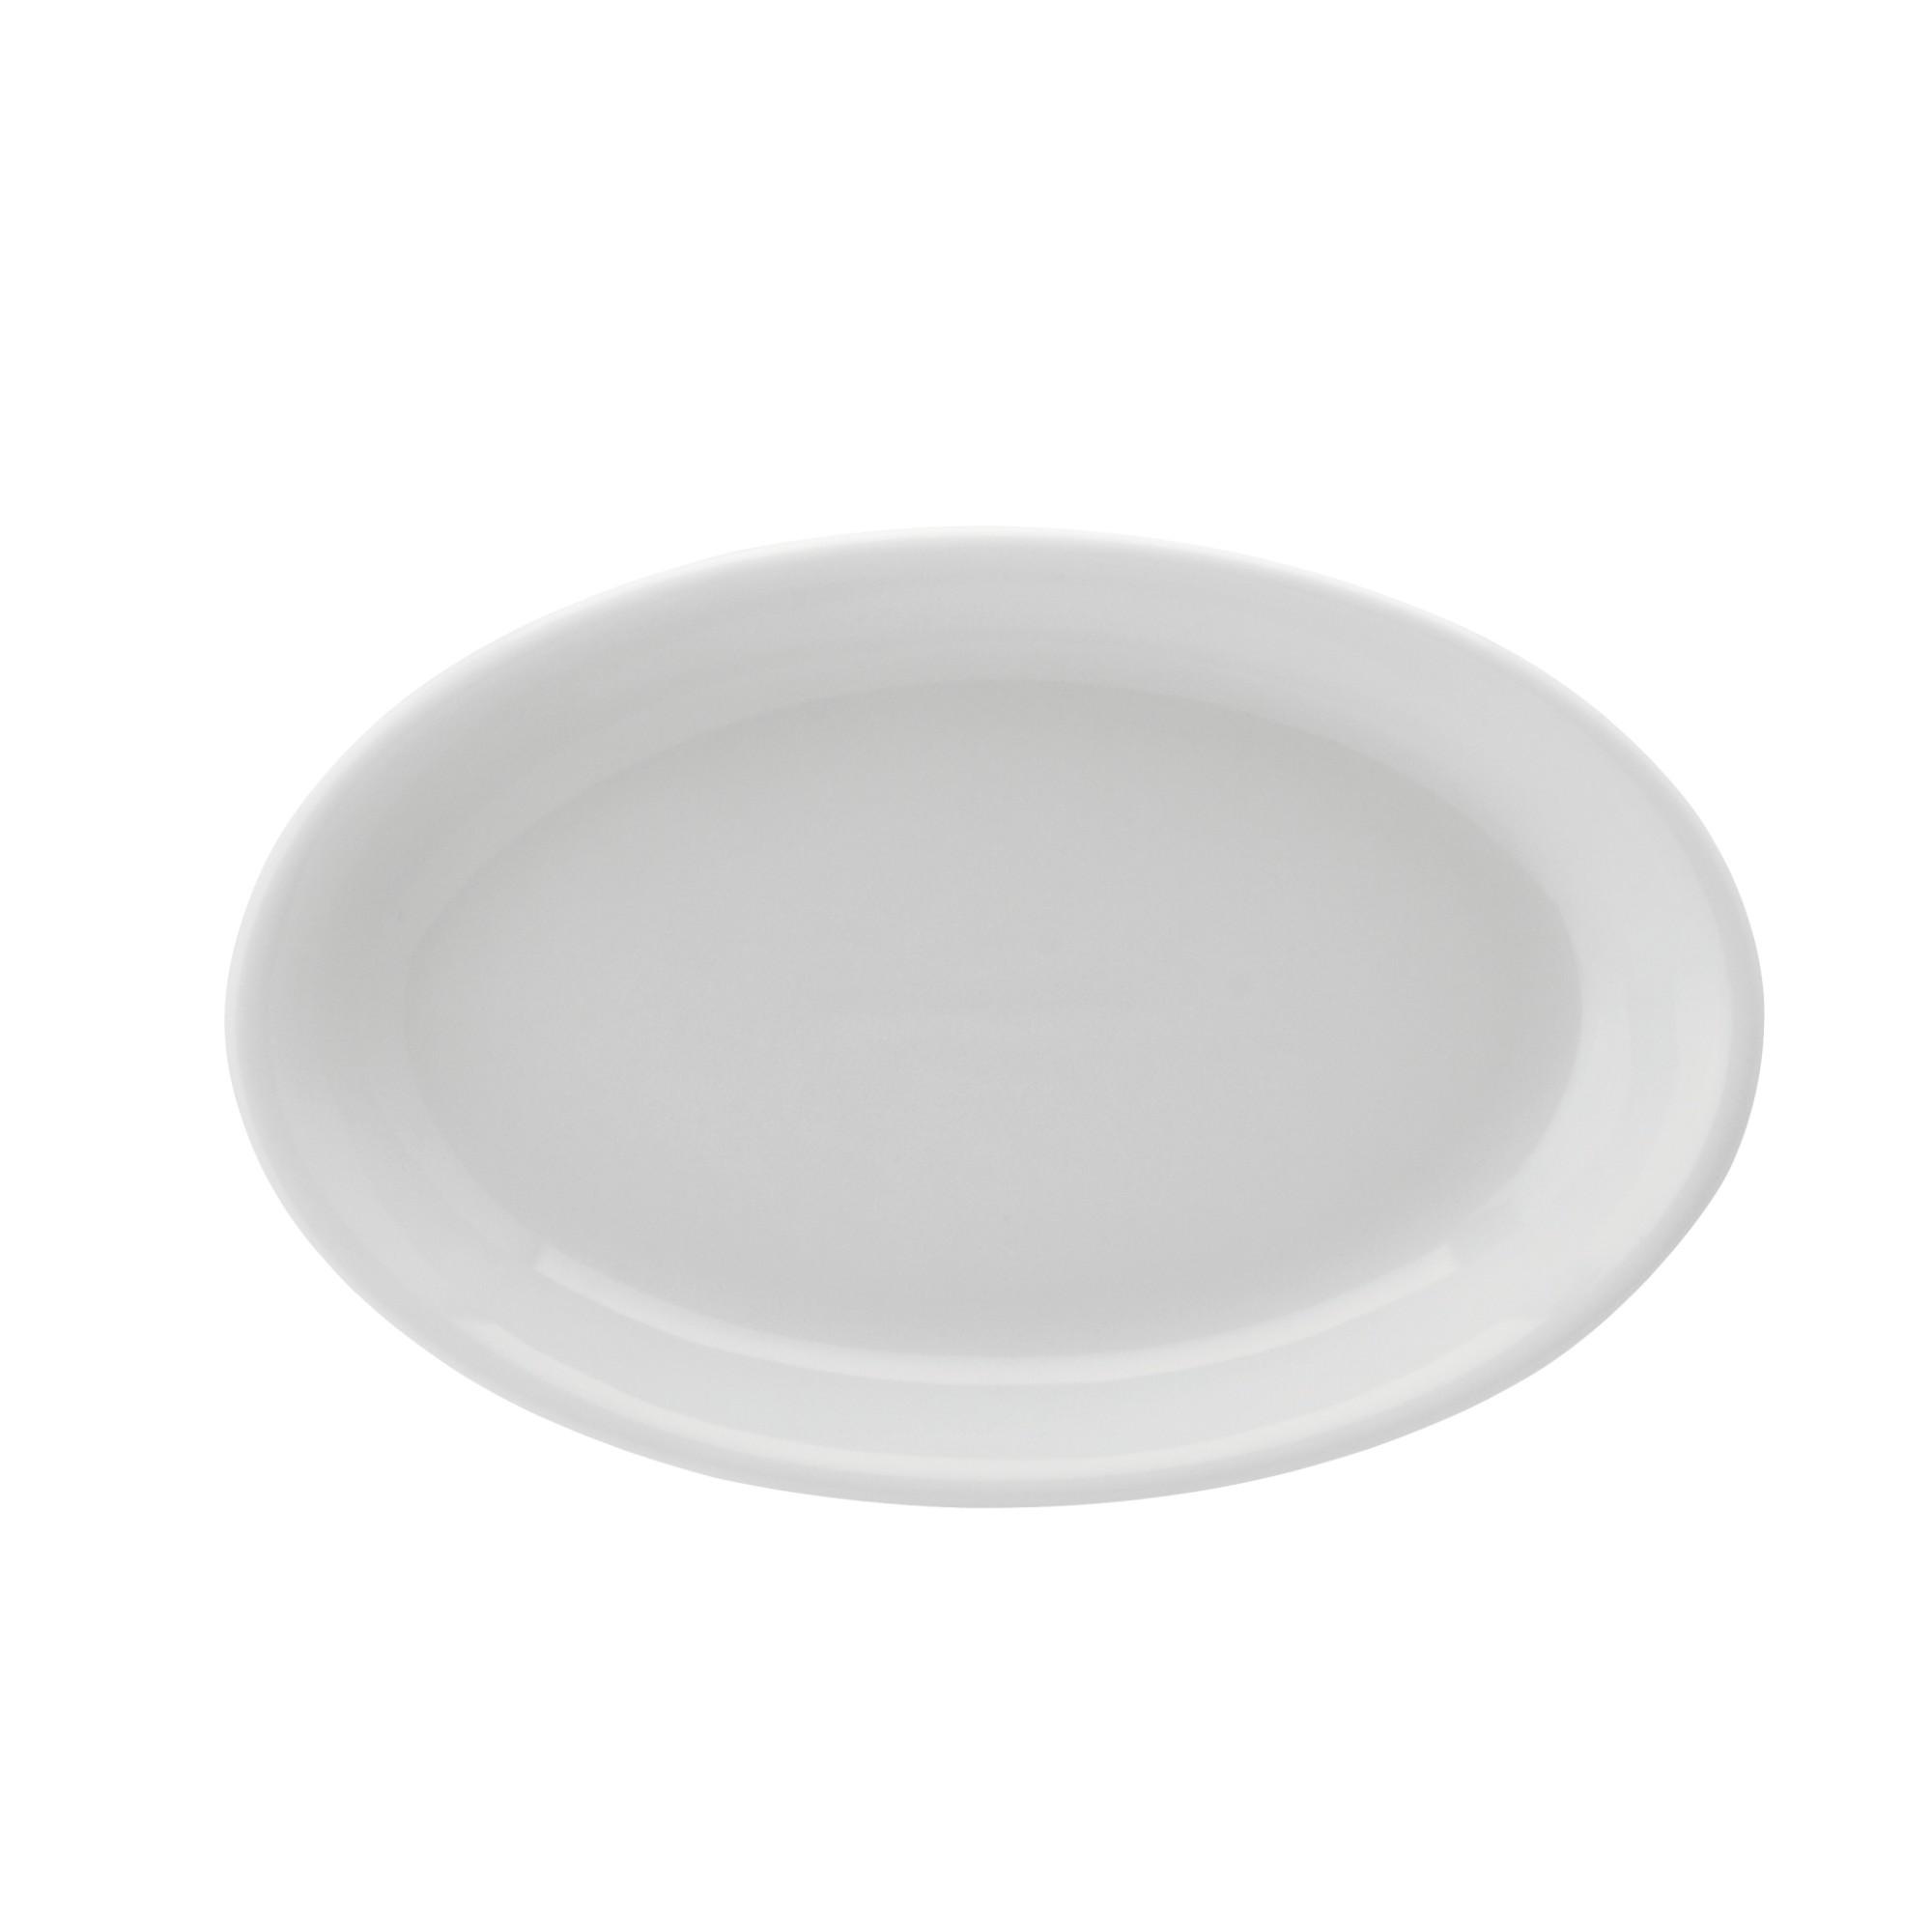 Travessa de Porcelana Oval 21cm Branca - Schmidt